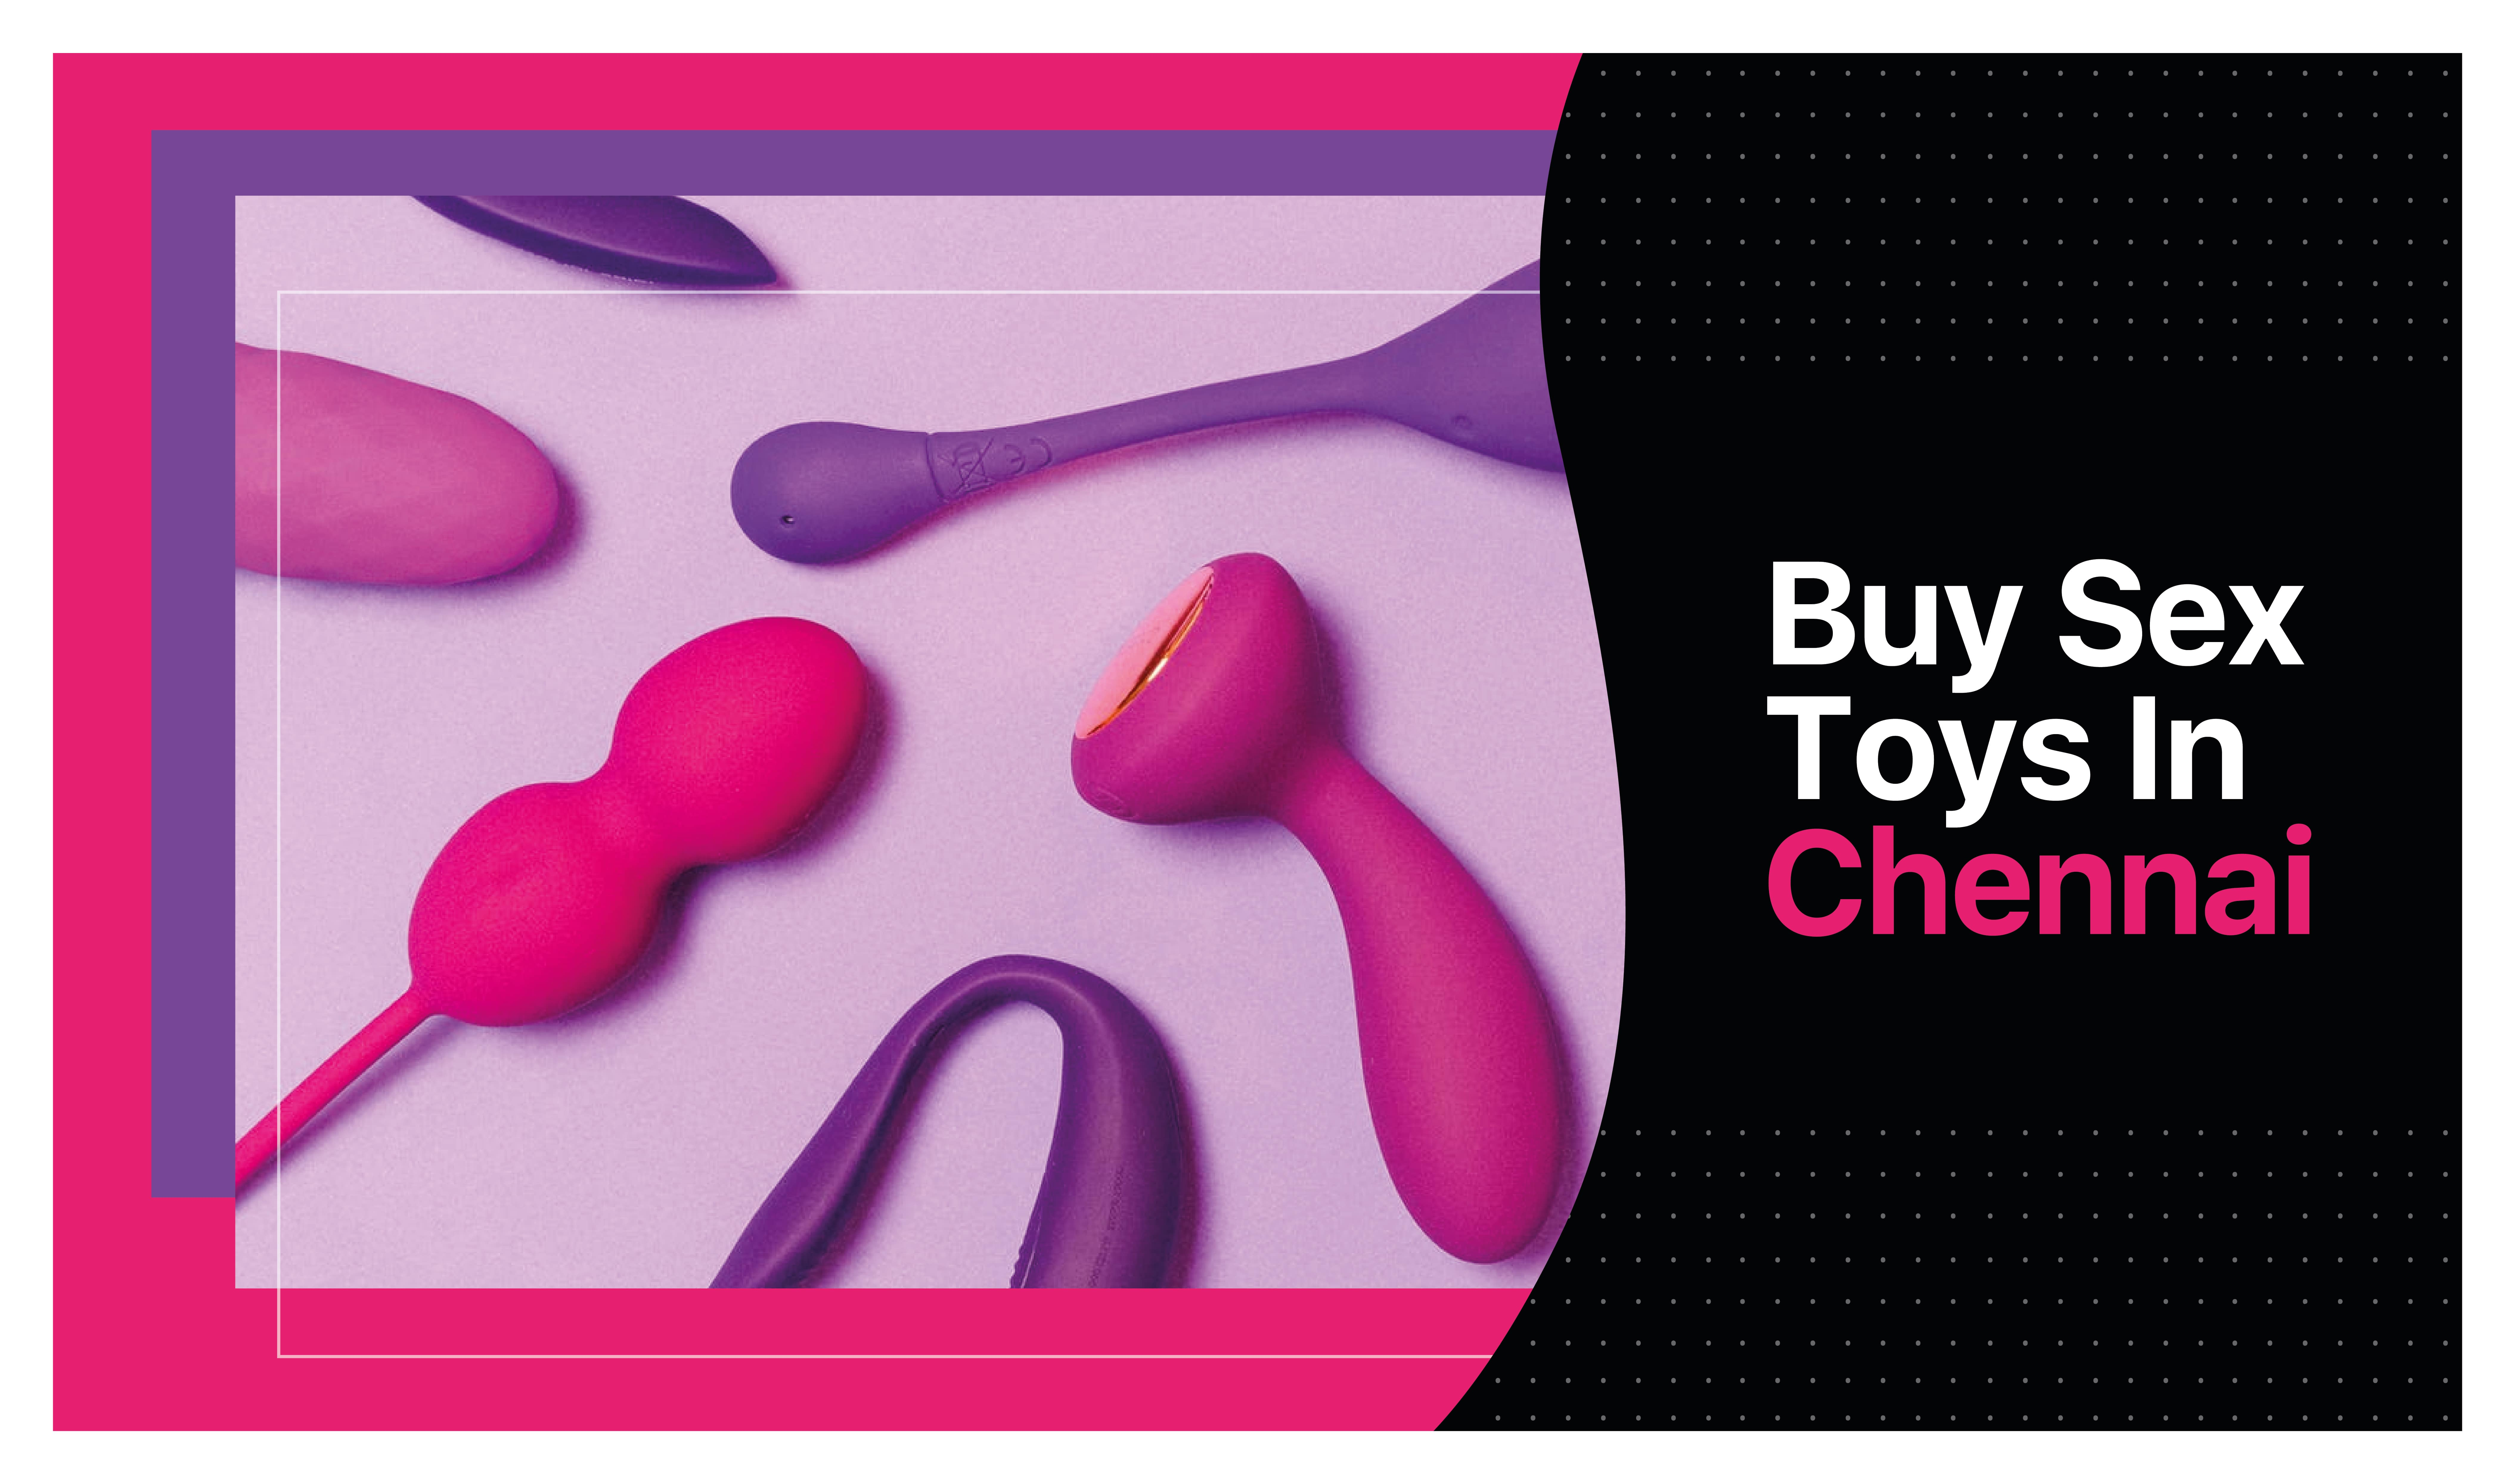 Chennai Sex Toy Store | Buy Sex Toys in Chennai